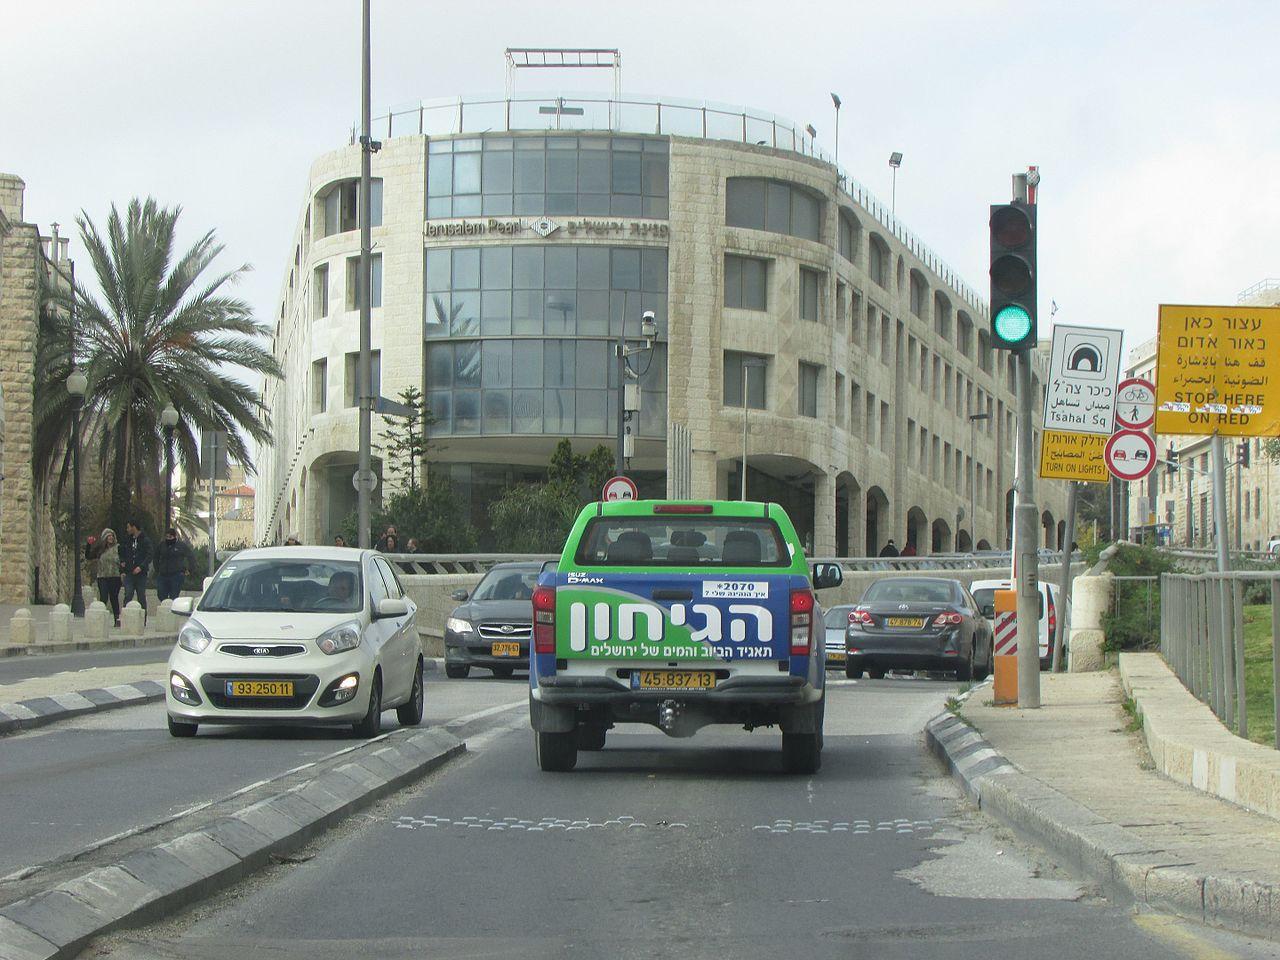 Jerusalem Pearl Hotel7848.JPG